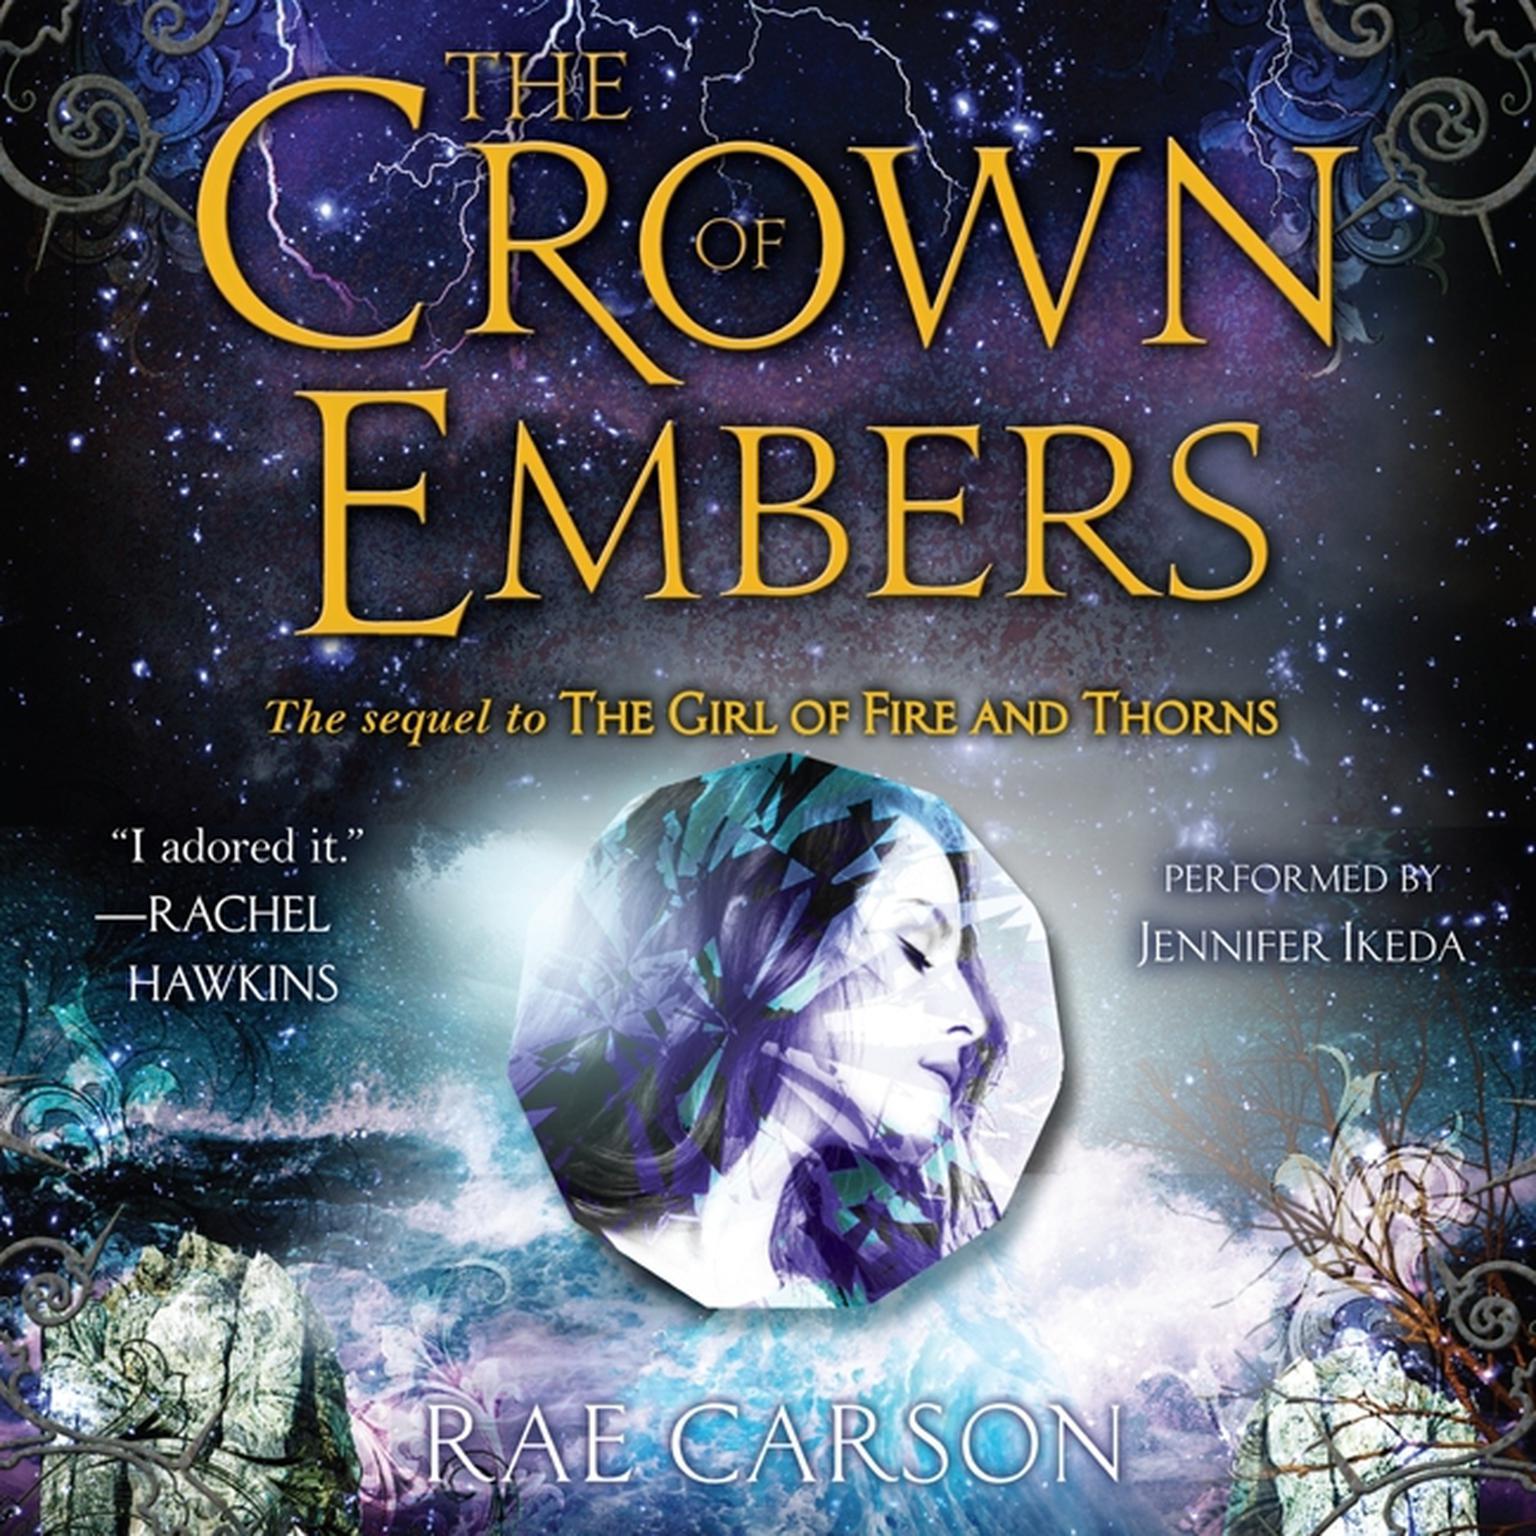 Printable The Crown of Embers Audiobook Cover Art